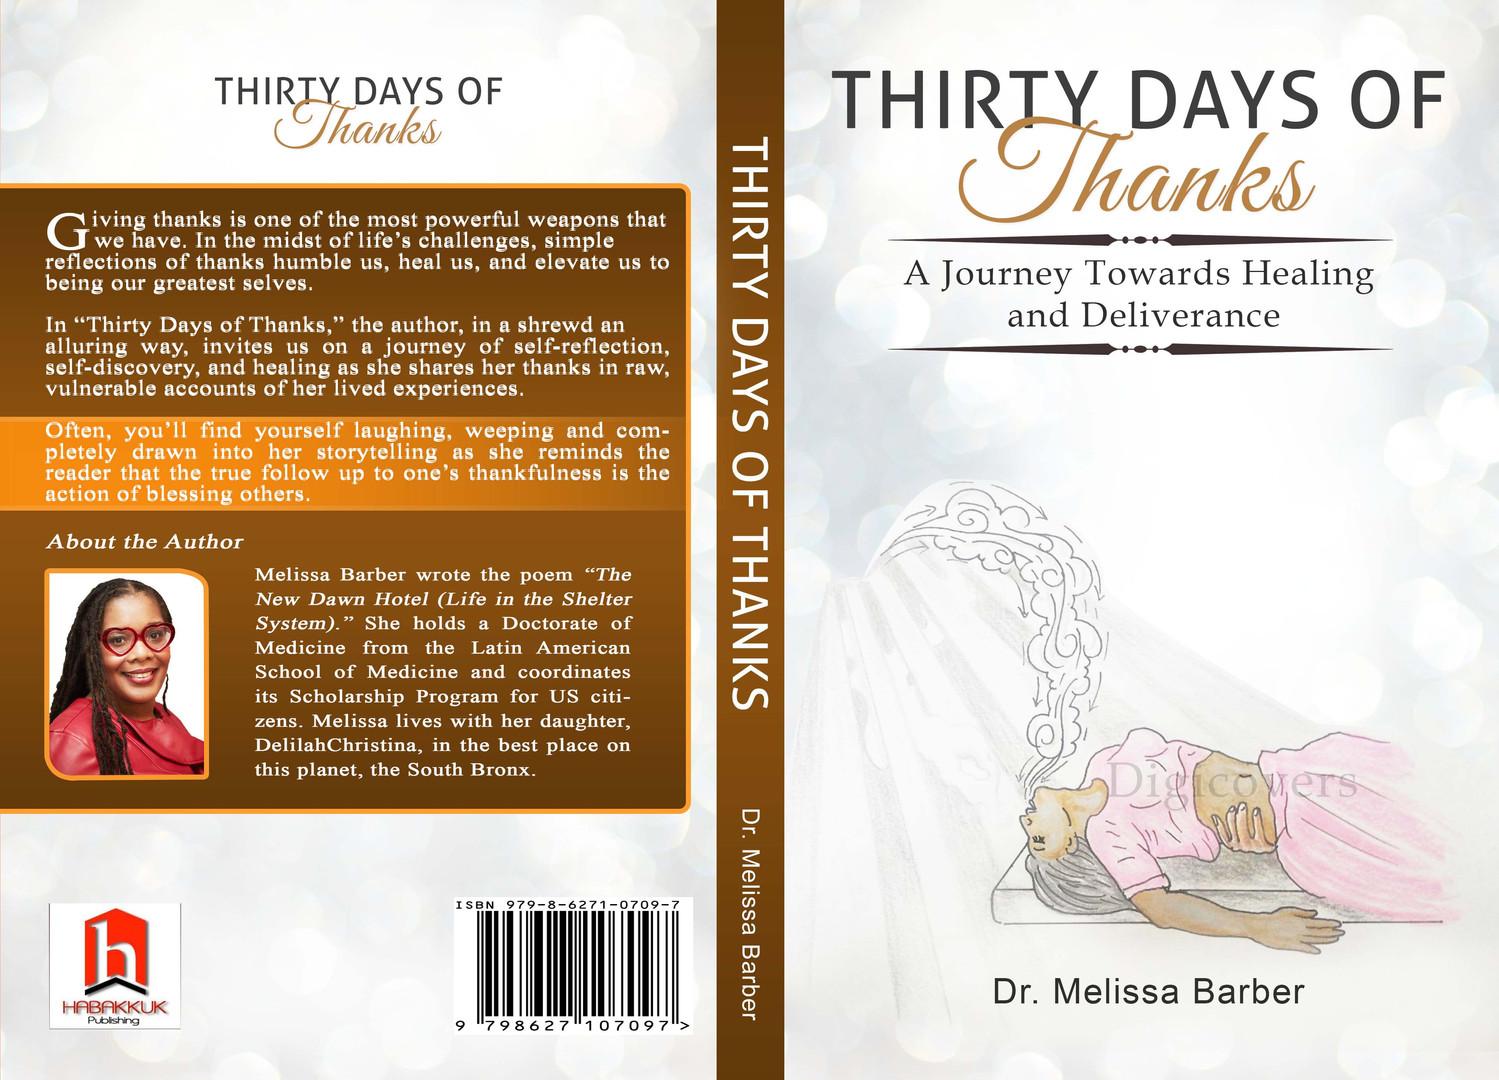 thirty days full cover.jpg